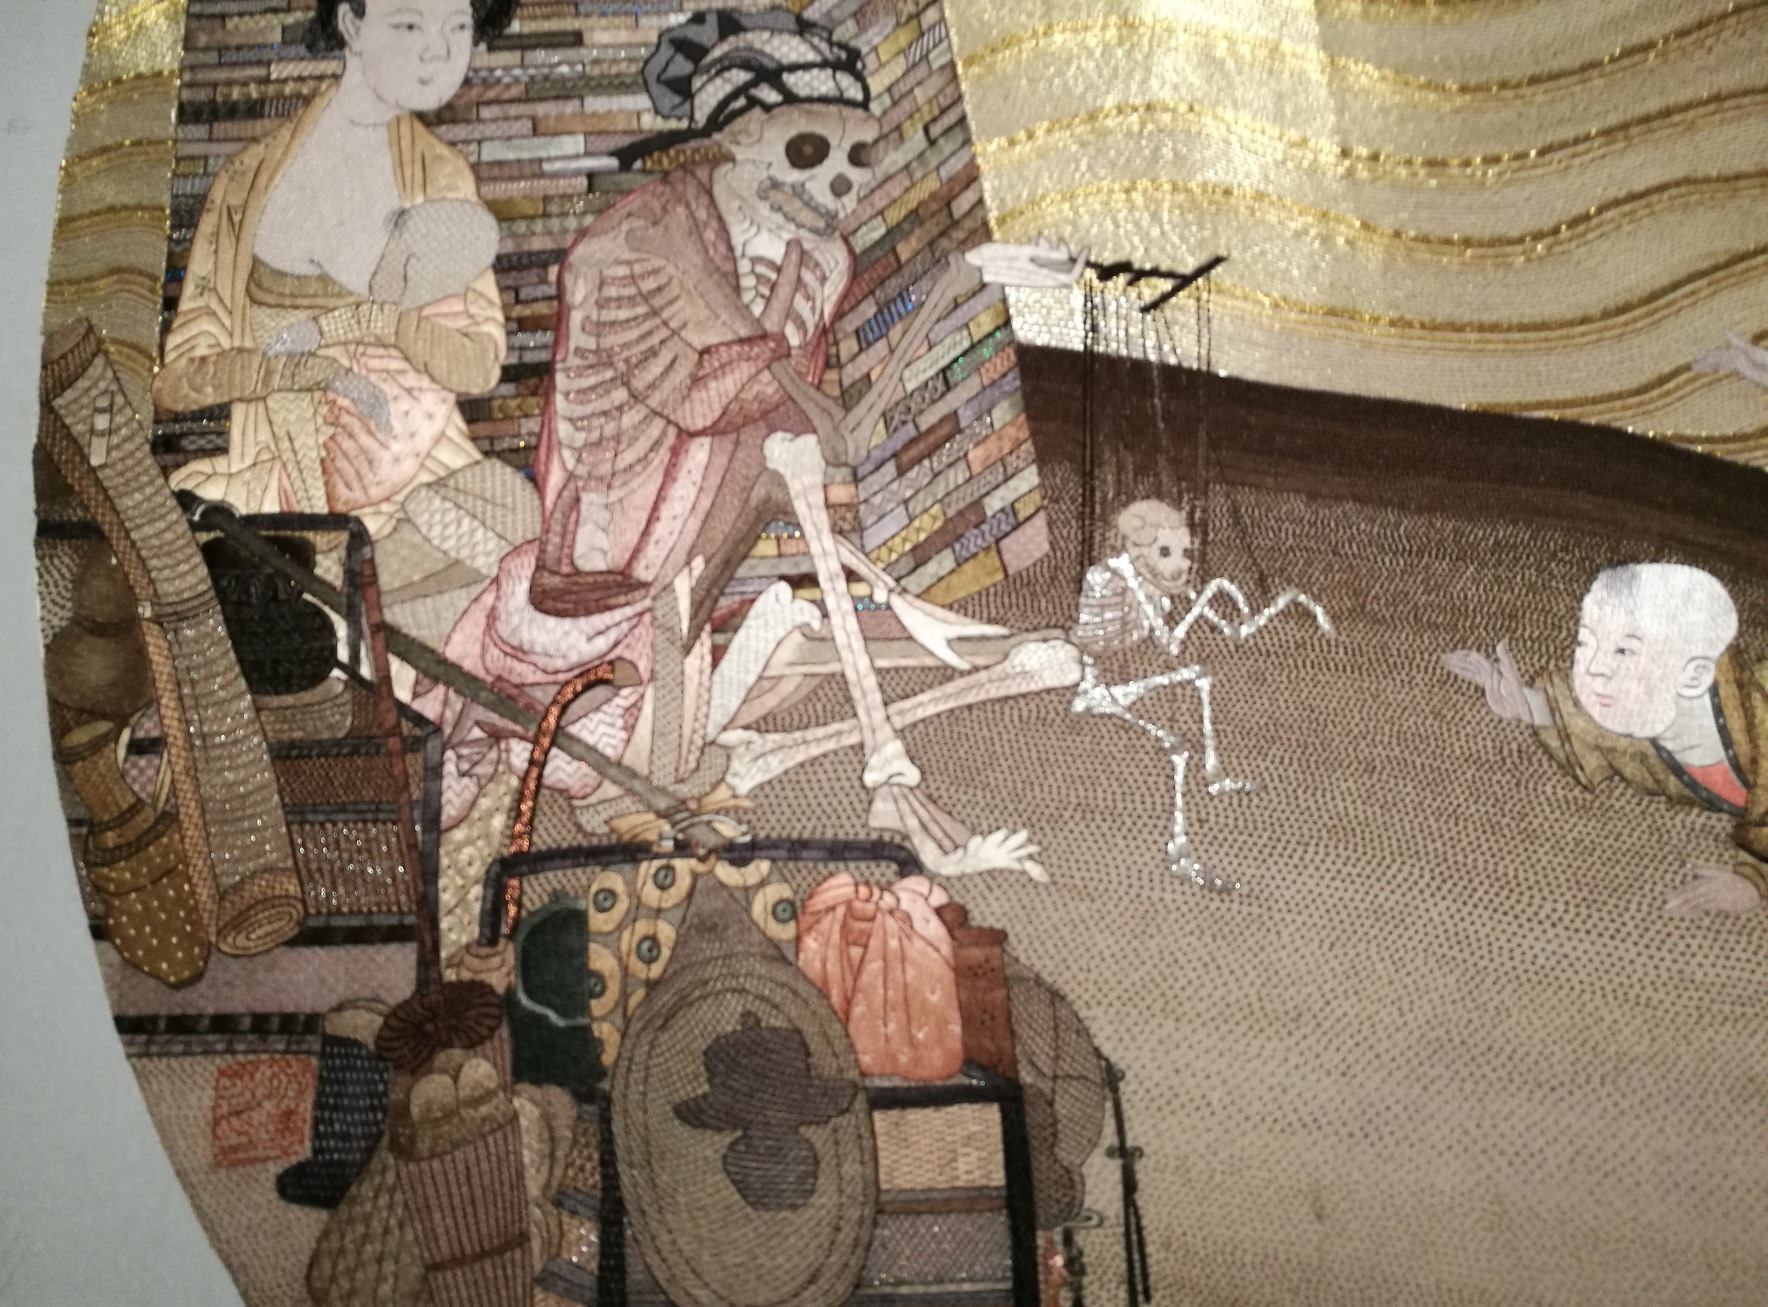 Yao Huifen, The skeleton fantasy show (particolare del ricamo), 2017; Photo: Artbooms